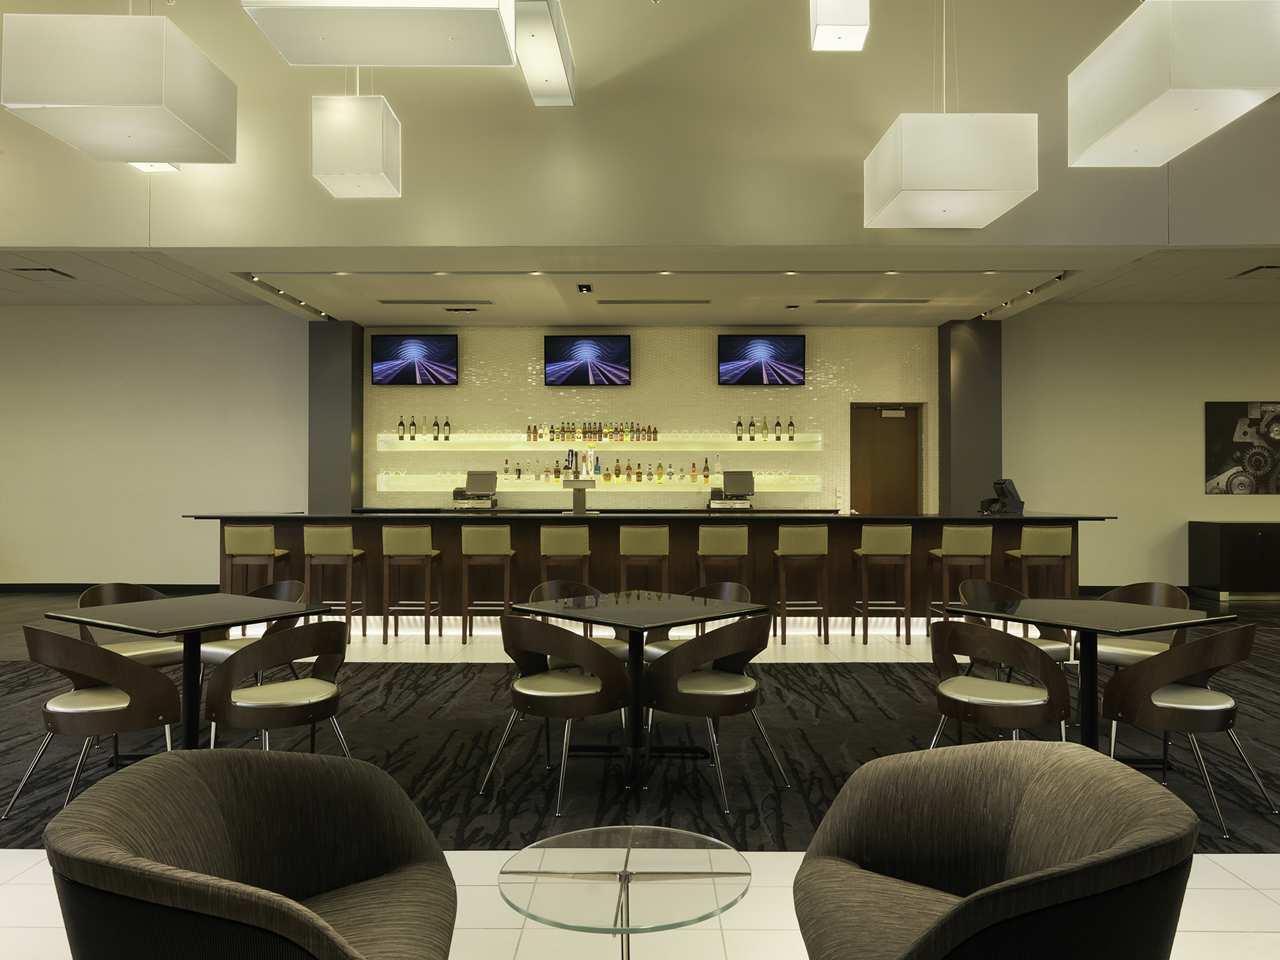 DoubleTree by Hilton Hotel Cedar Rapids Convention Complex image 26